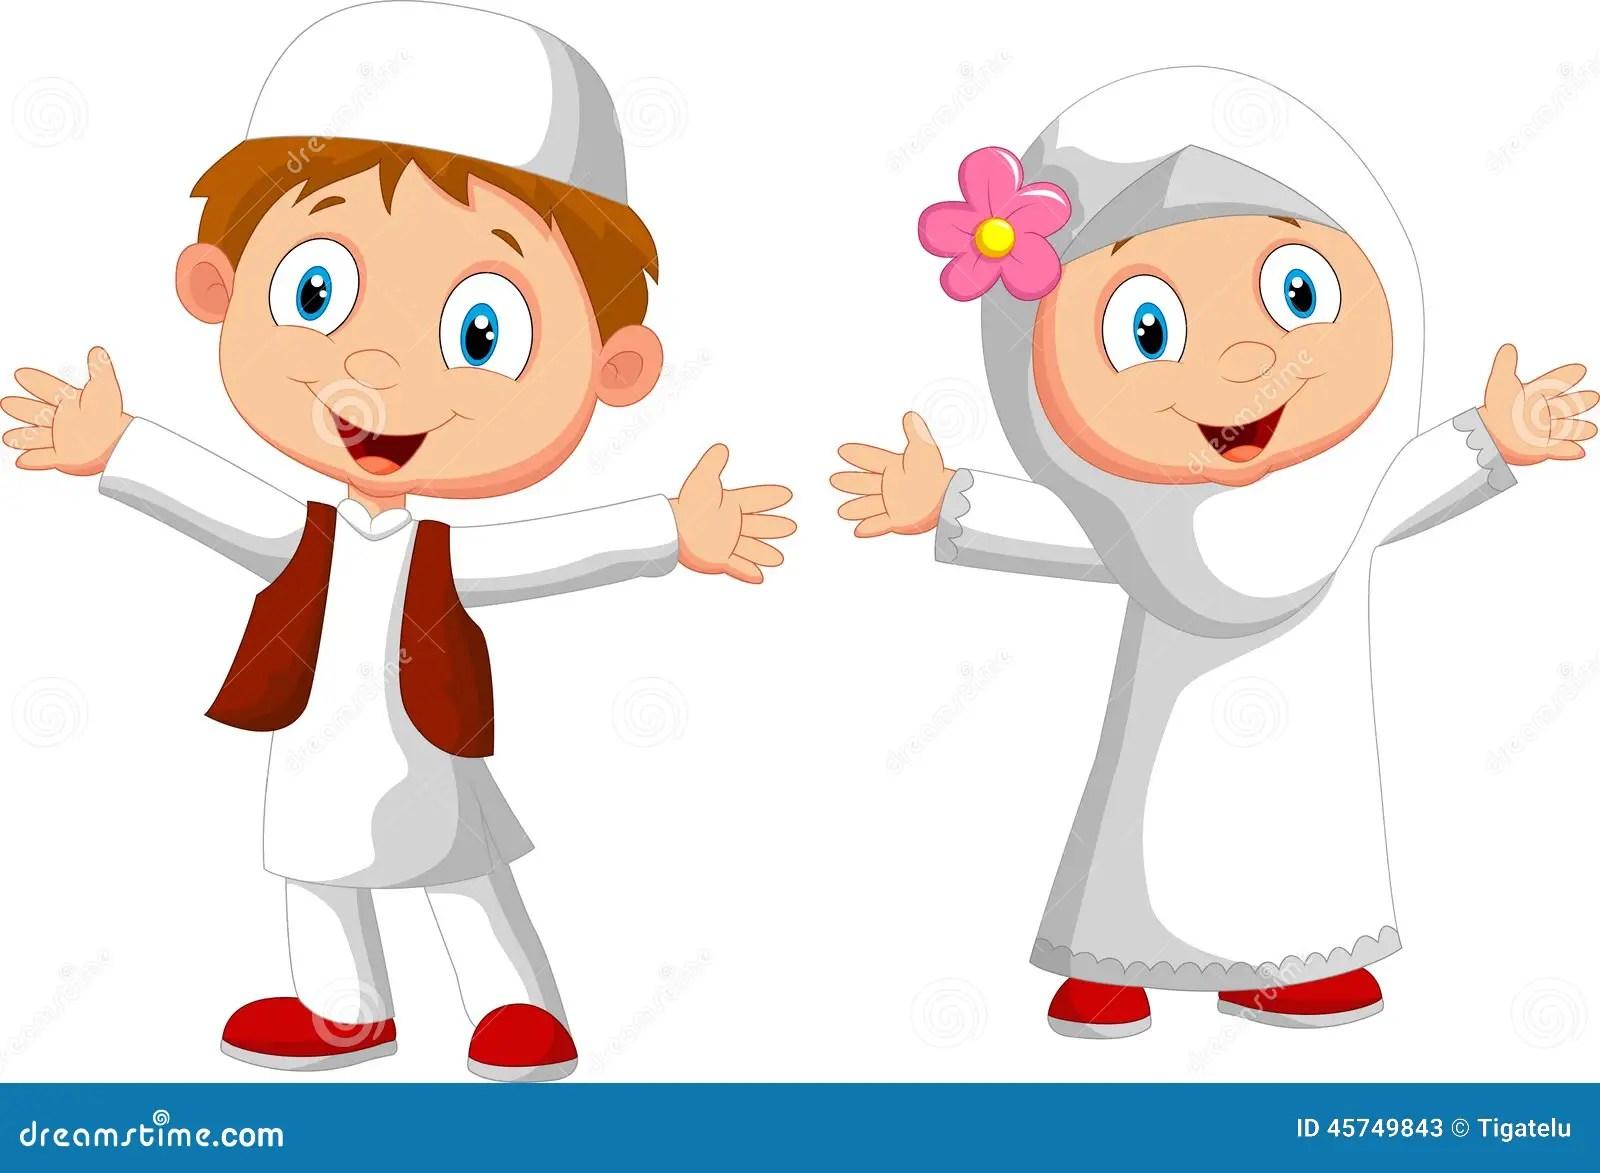 Happy Muslim kid cartoon stock vector Illustration of